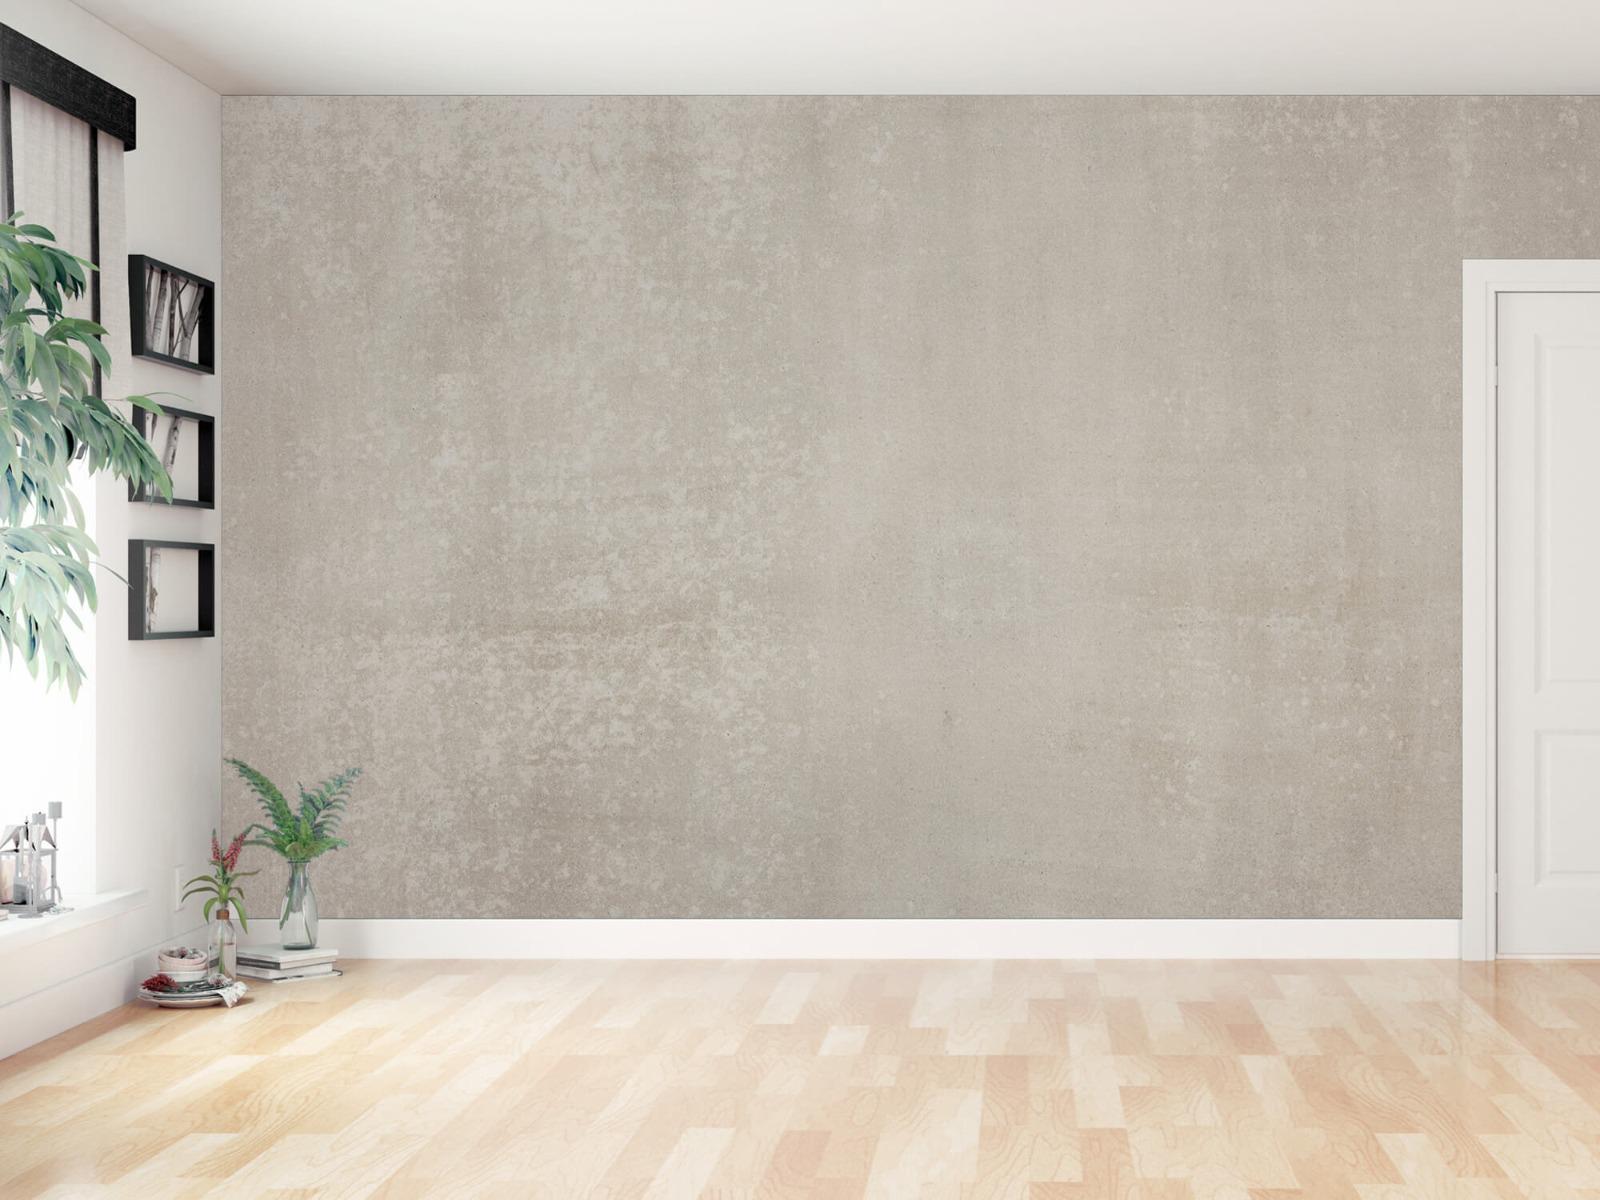 Betonlook behang - Taupe beton - Wallexclusive - Woonkamer 12